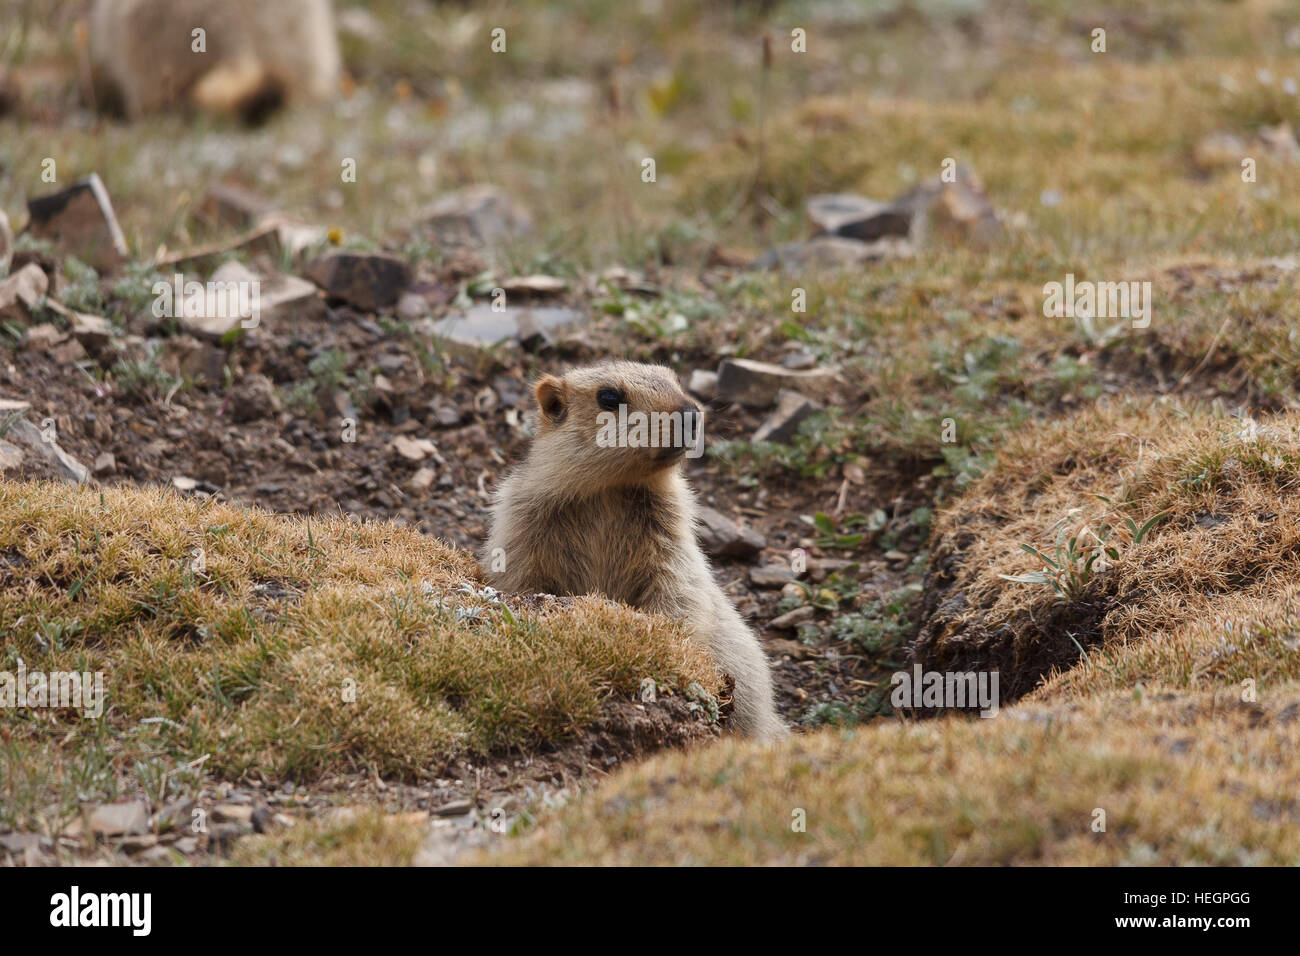 Young Himalayan marmot near its den, Tibetan plateau, Qinghai province, China - Stock Image